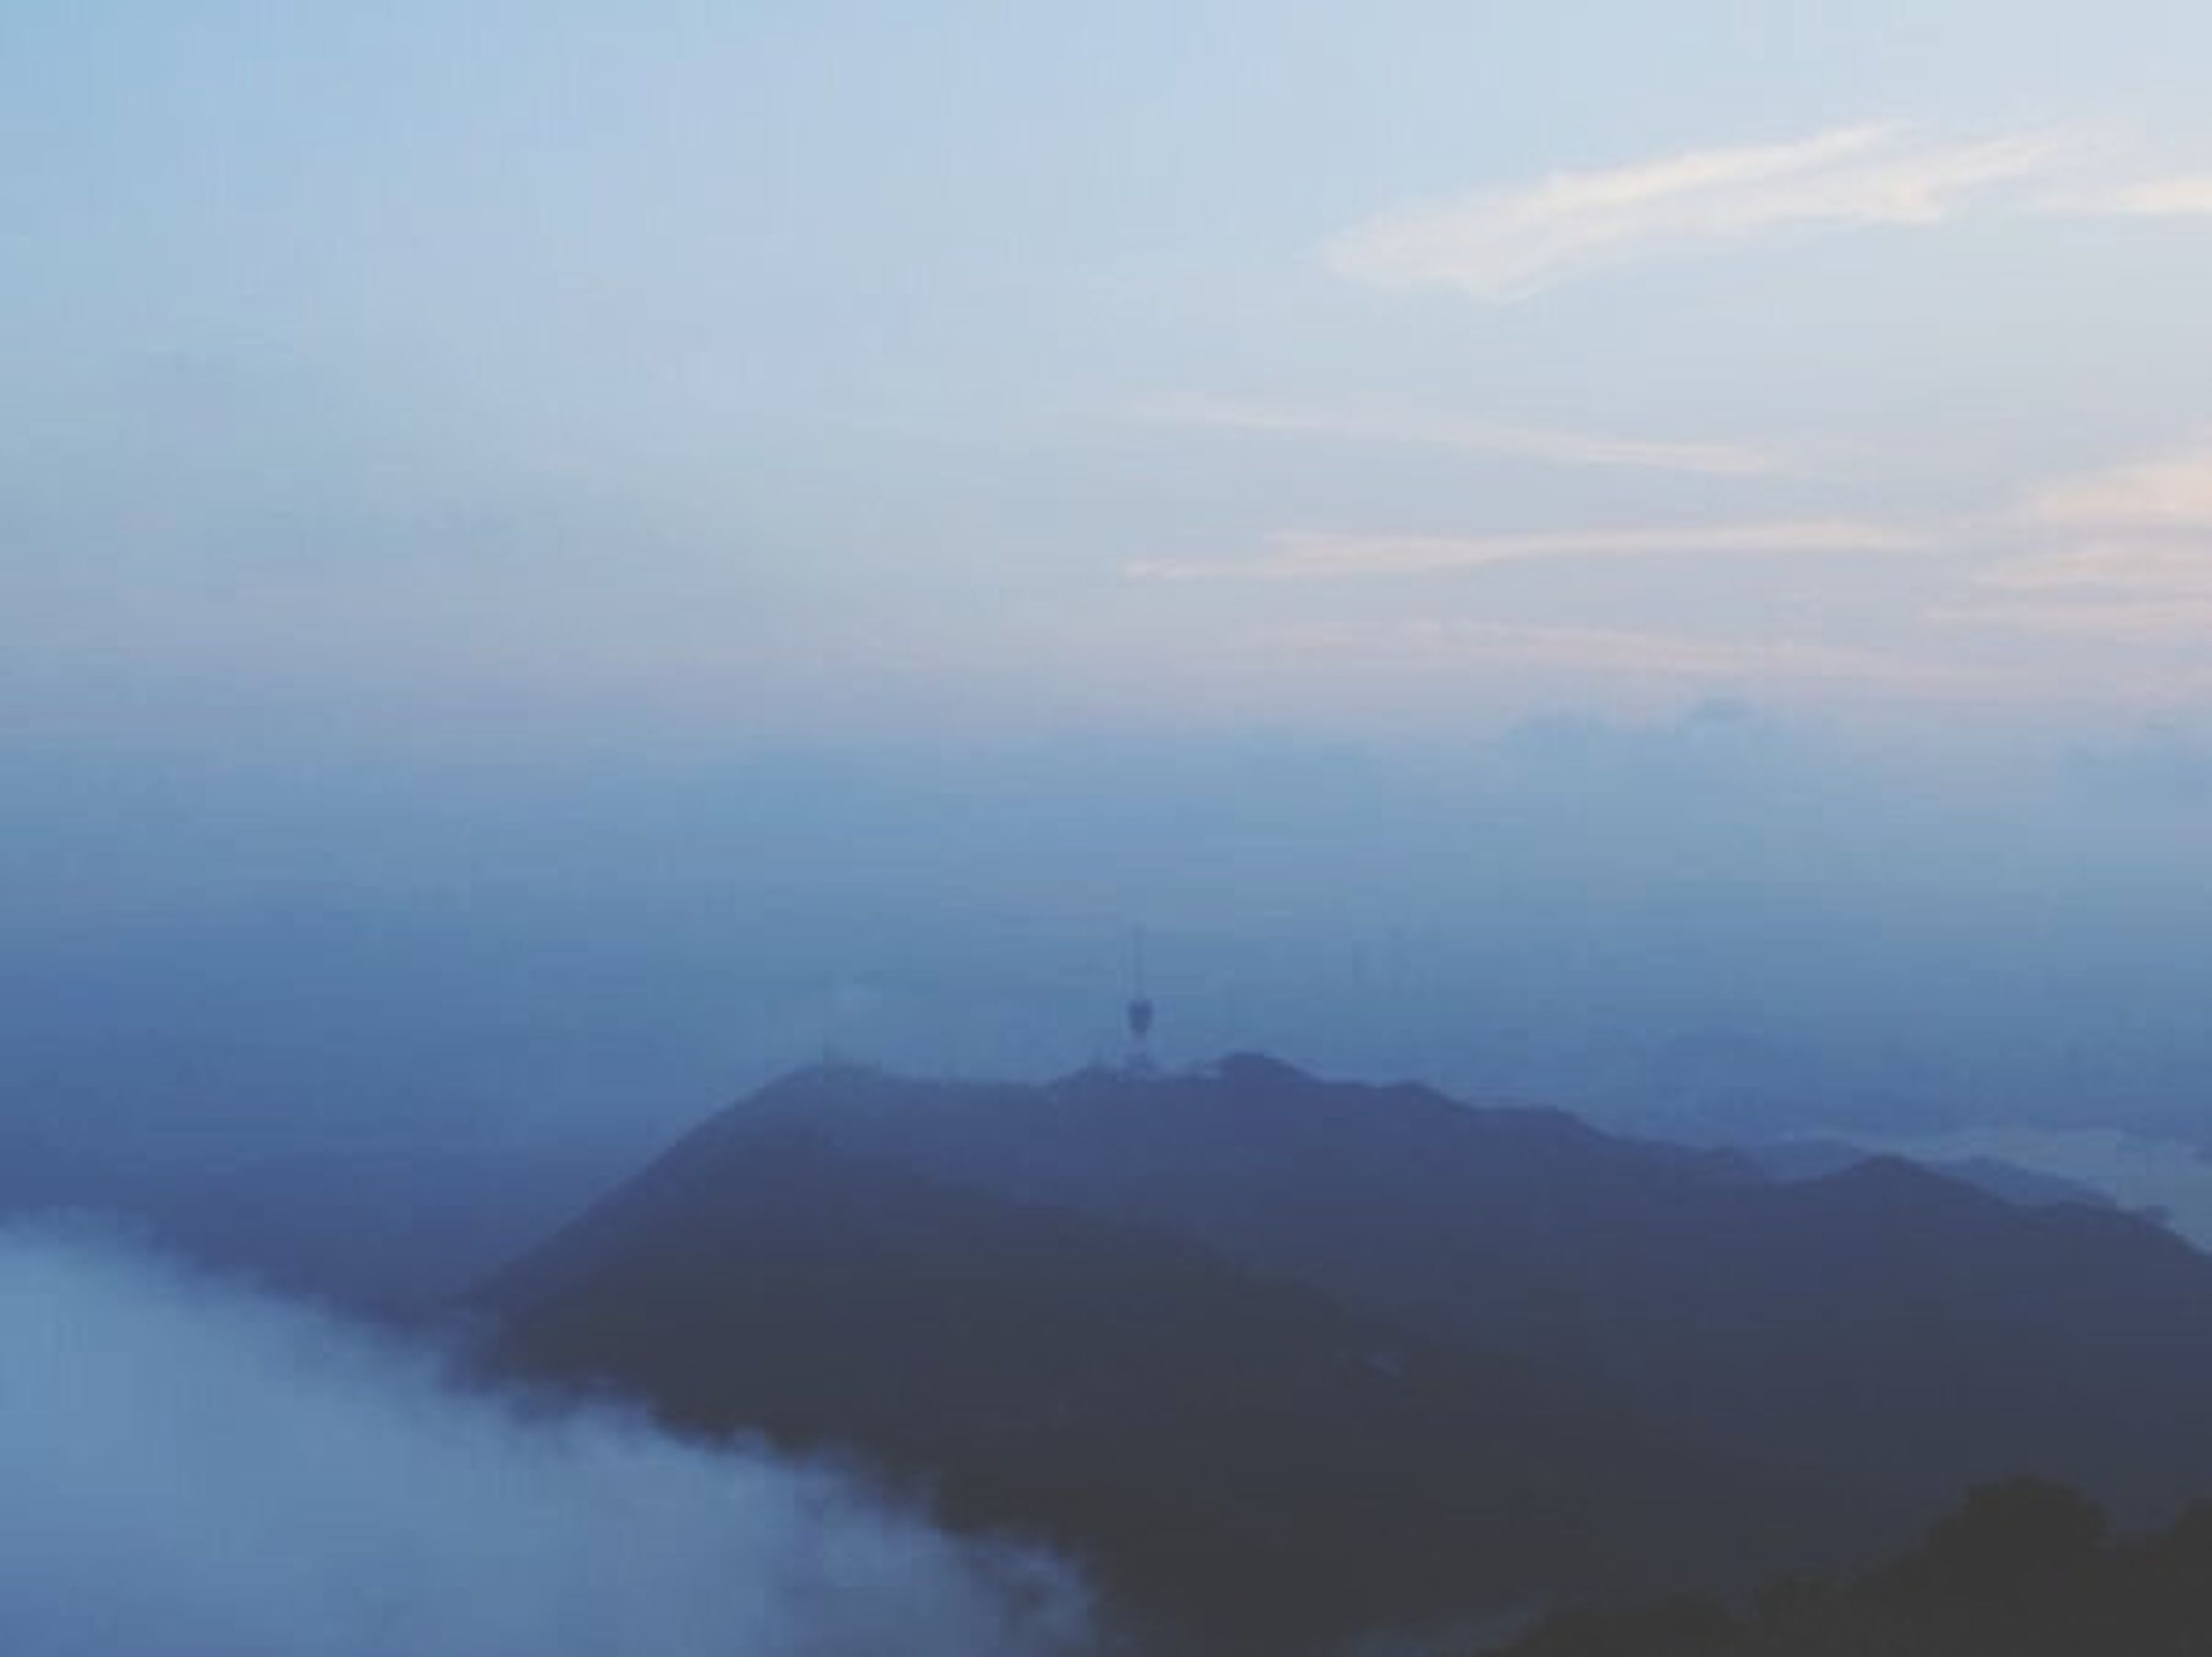 scenics, tranquil scene, tranquility, beauty in nature, fog, mountain, sky, nature, idyllic, foggy, water, landscape, cloud - sky, sea, weather, non-urban scene, mountain range, remote, dusk, outdoors